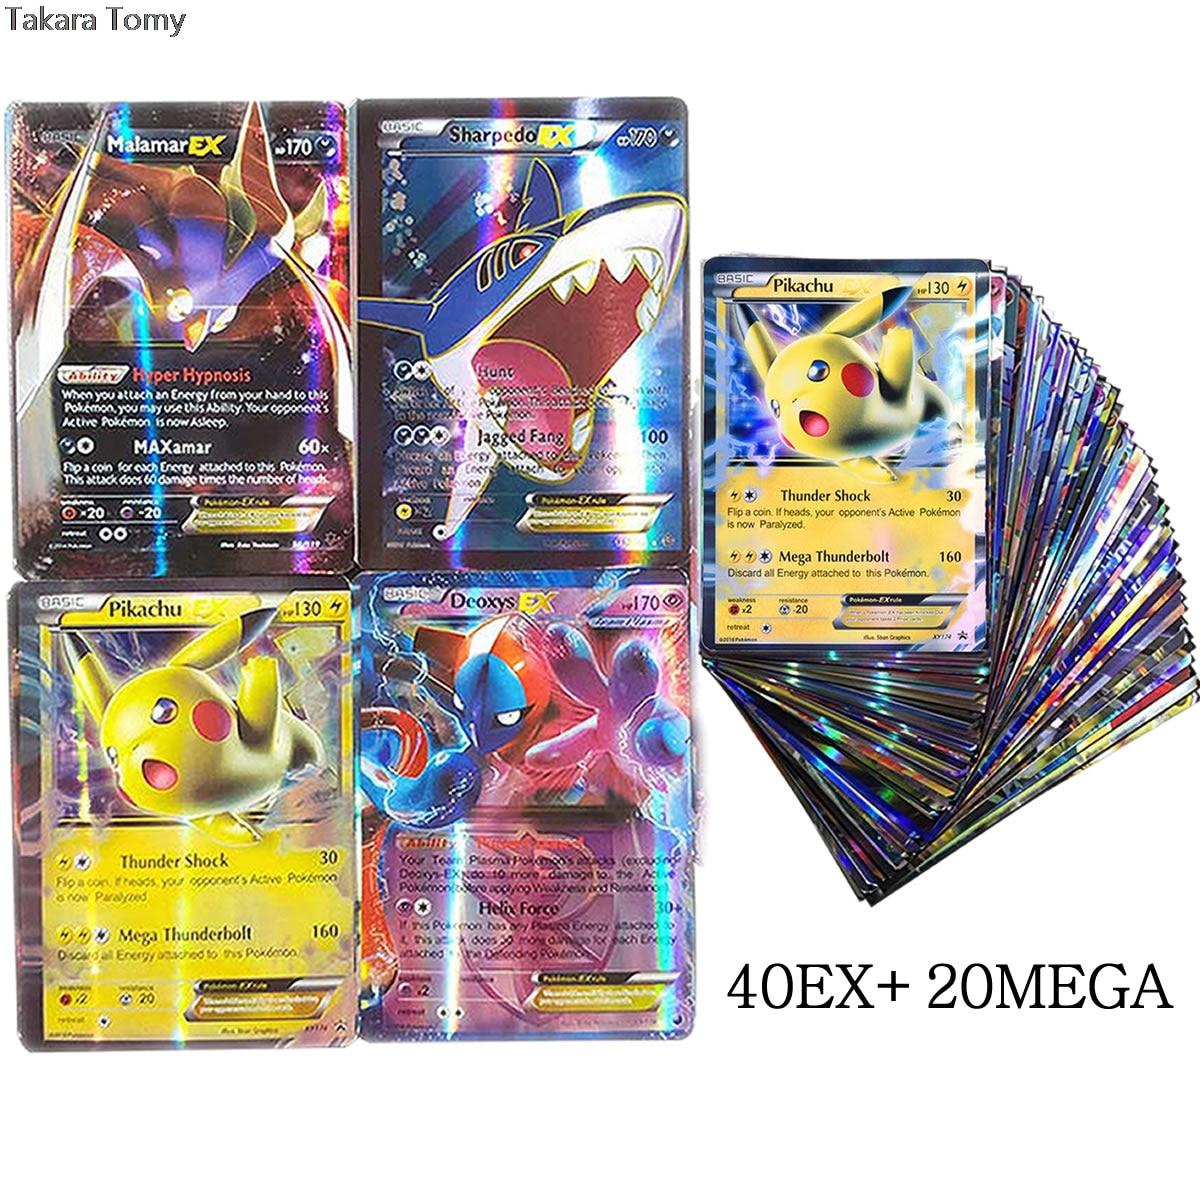 60 unids/caja TAKARA TOMY Pokemon Tarjeta de batalla EX MEGA Booster caja inglés juego de intercambio tarjeta brillante lista de carga superior juguete para regalo para chico